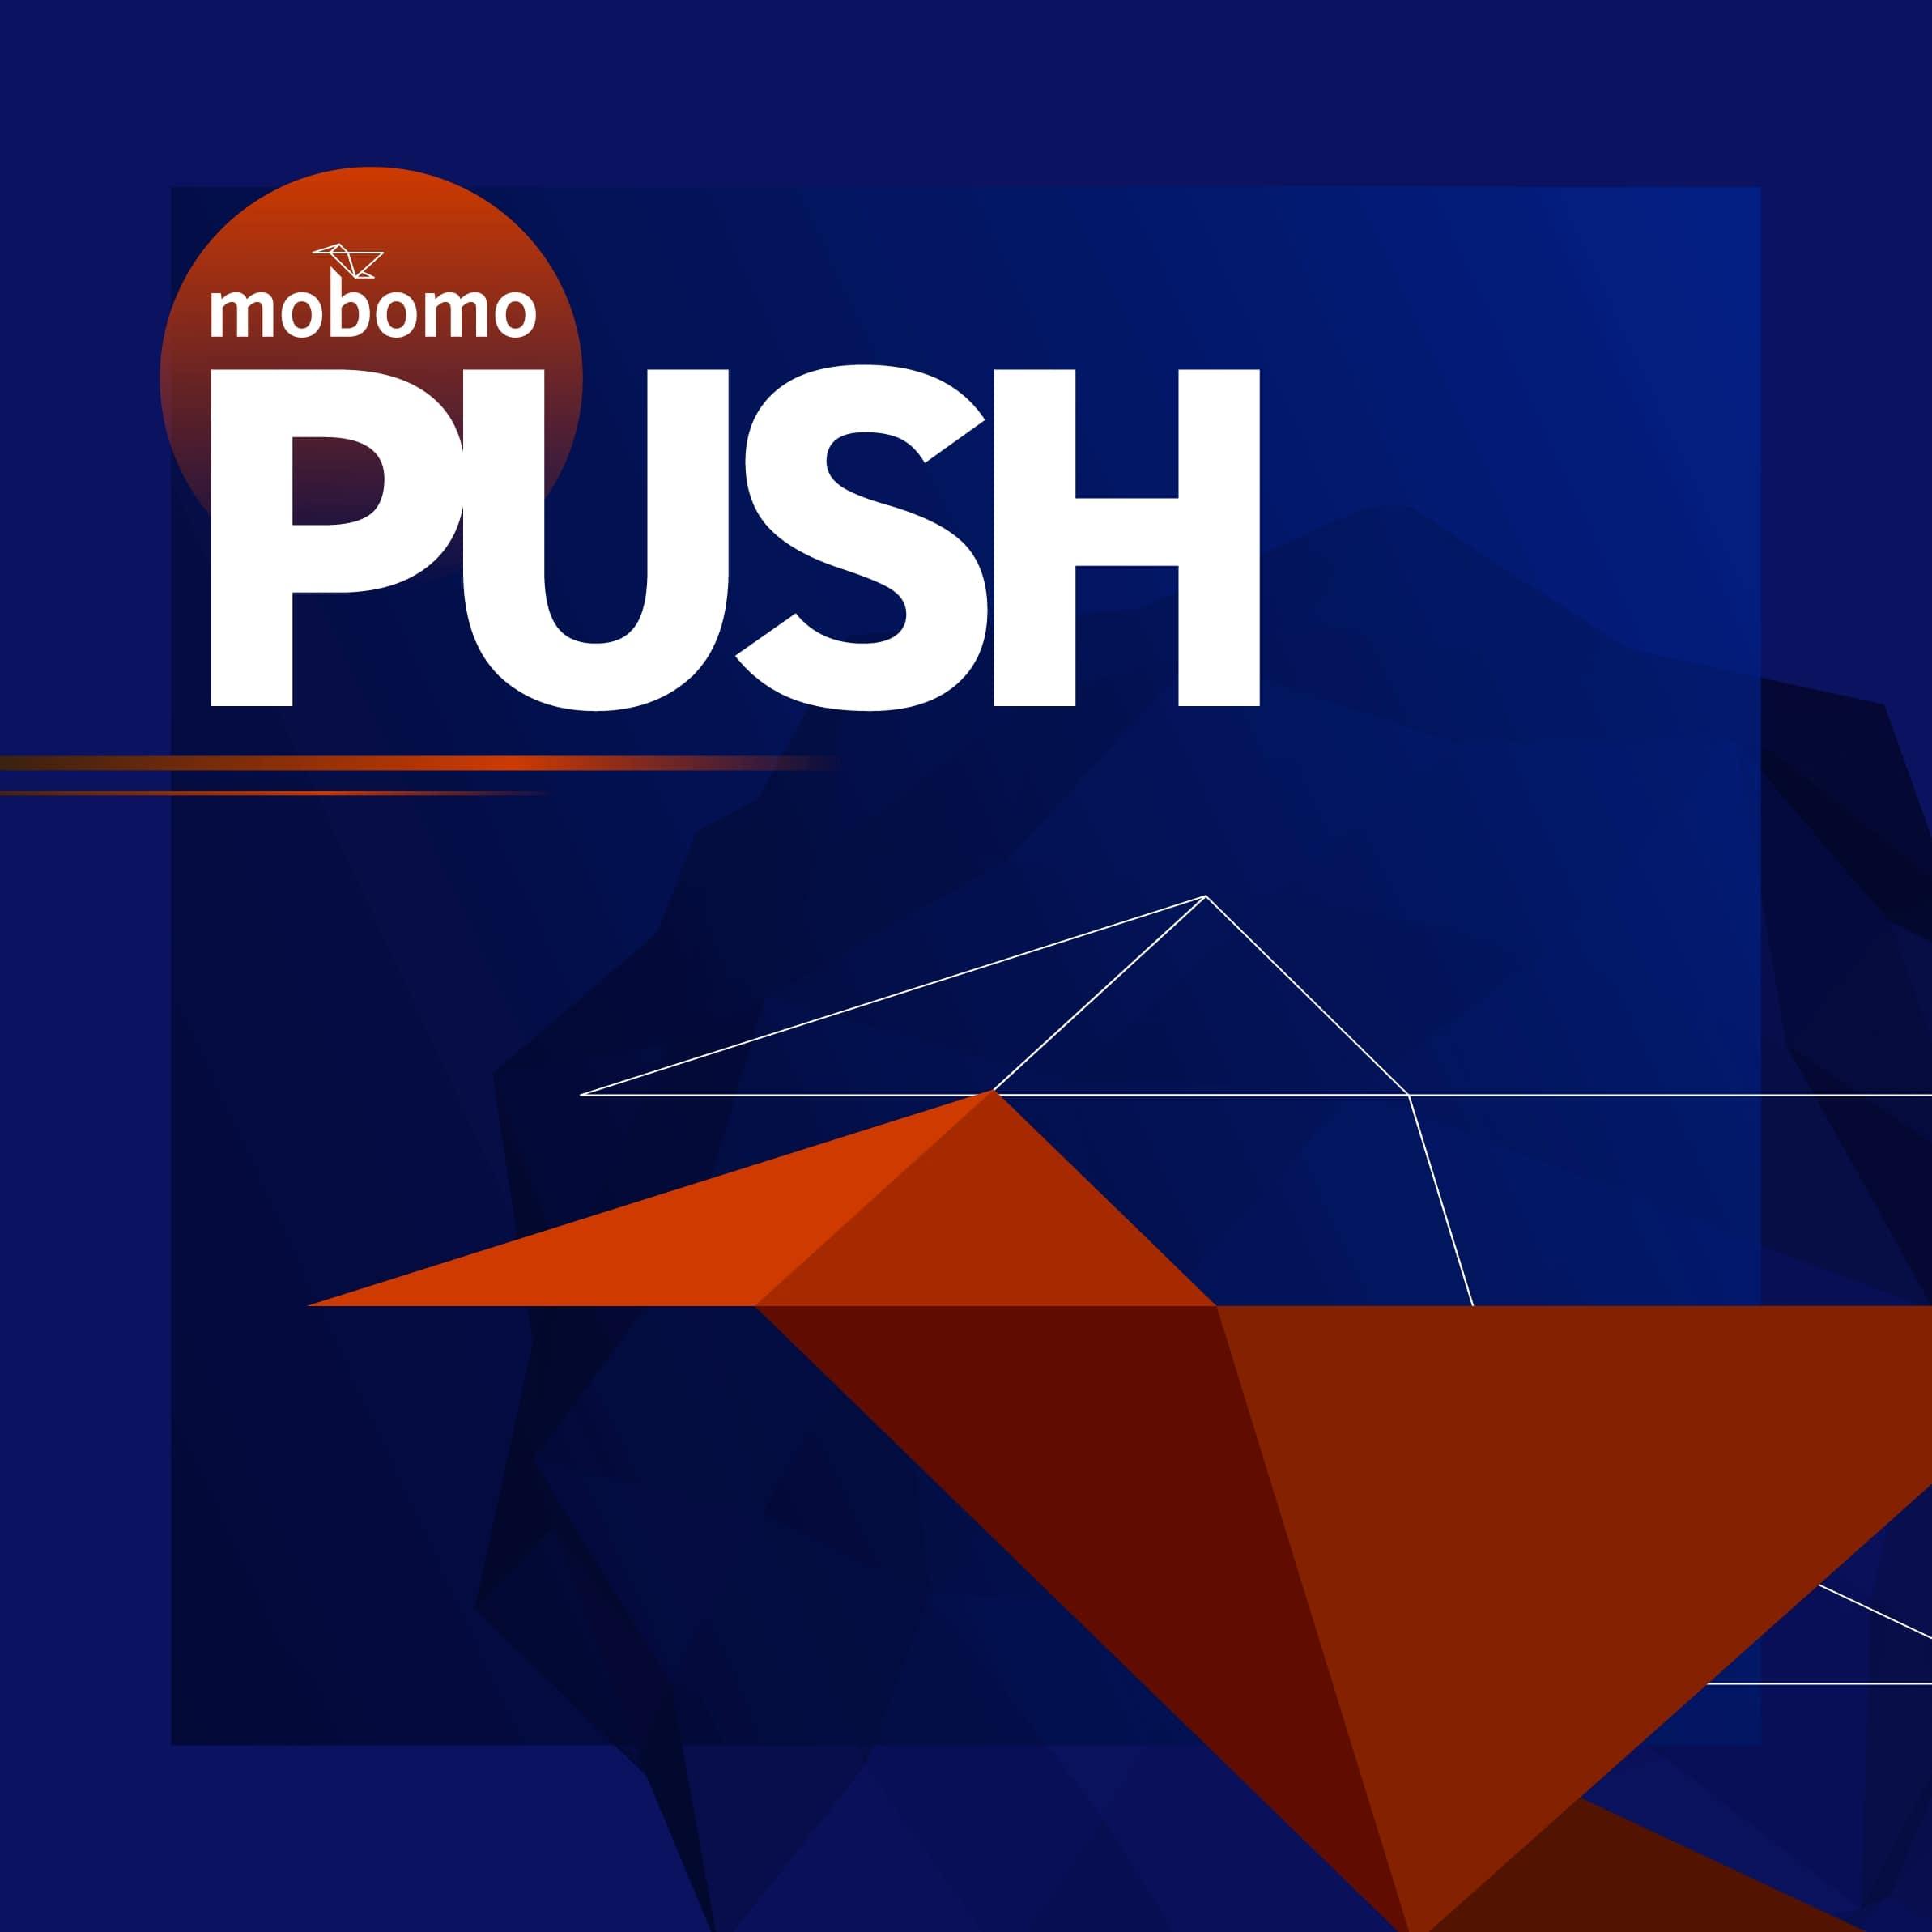 Presskit mobomo code